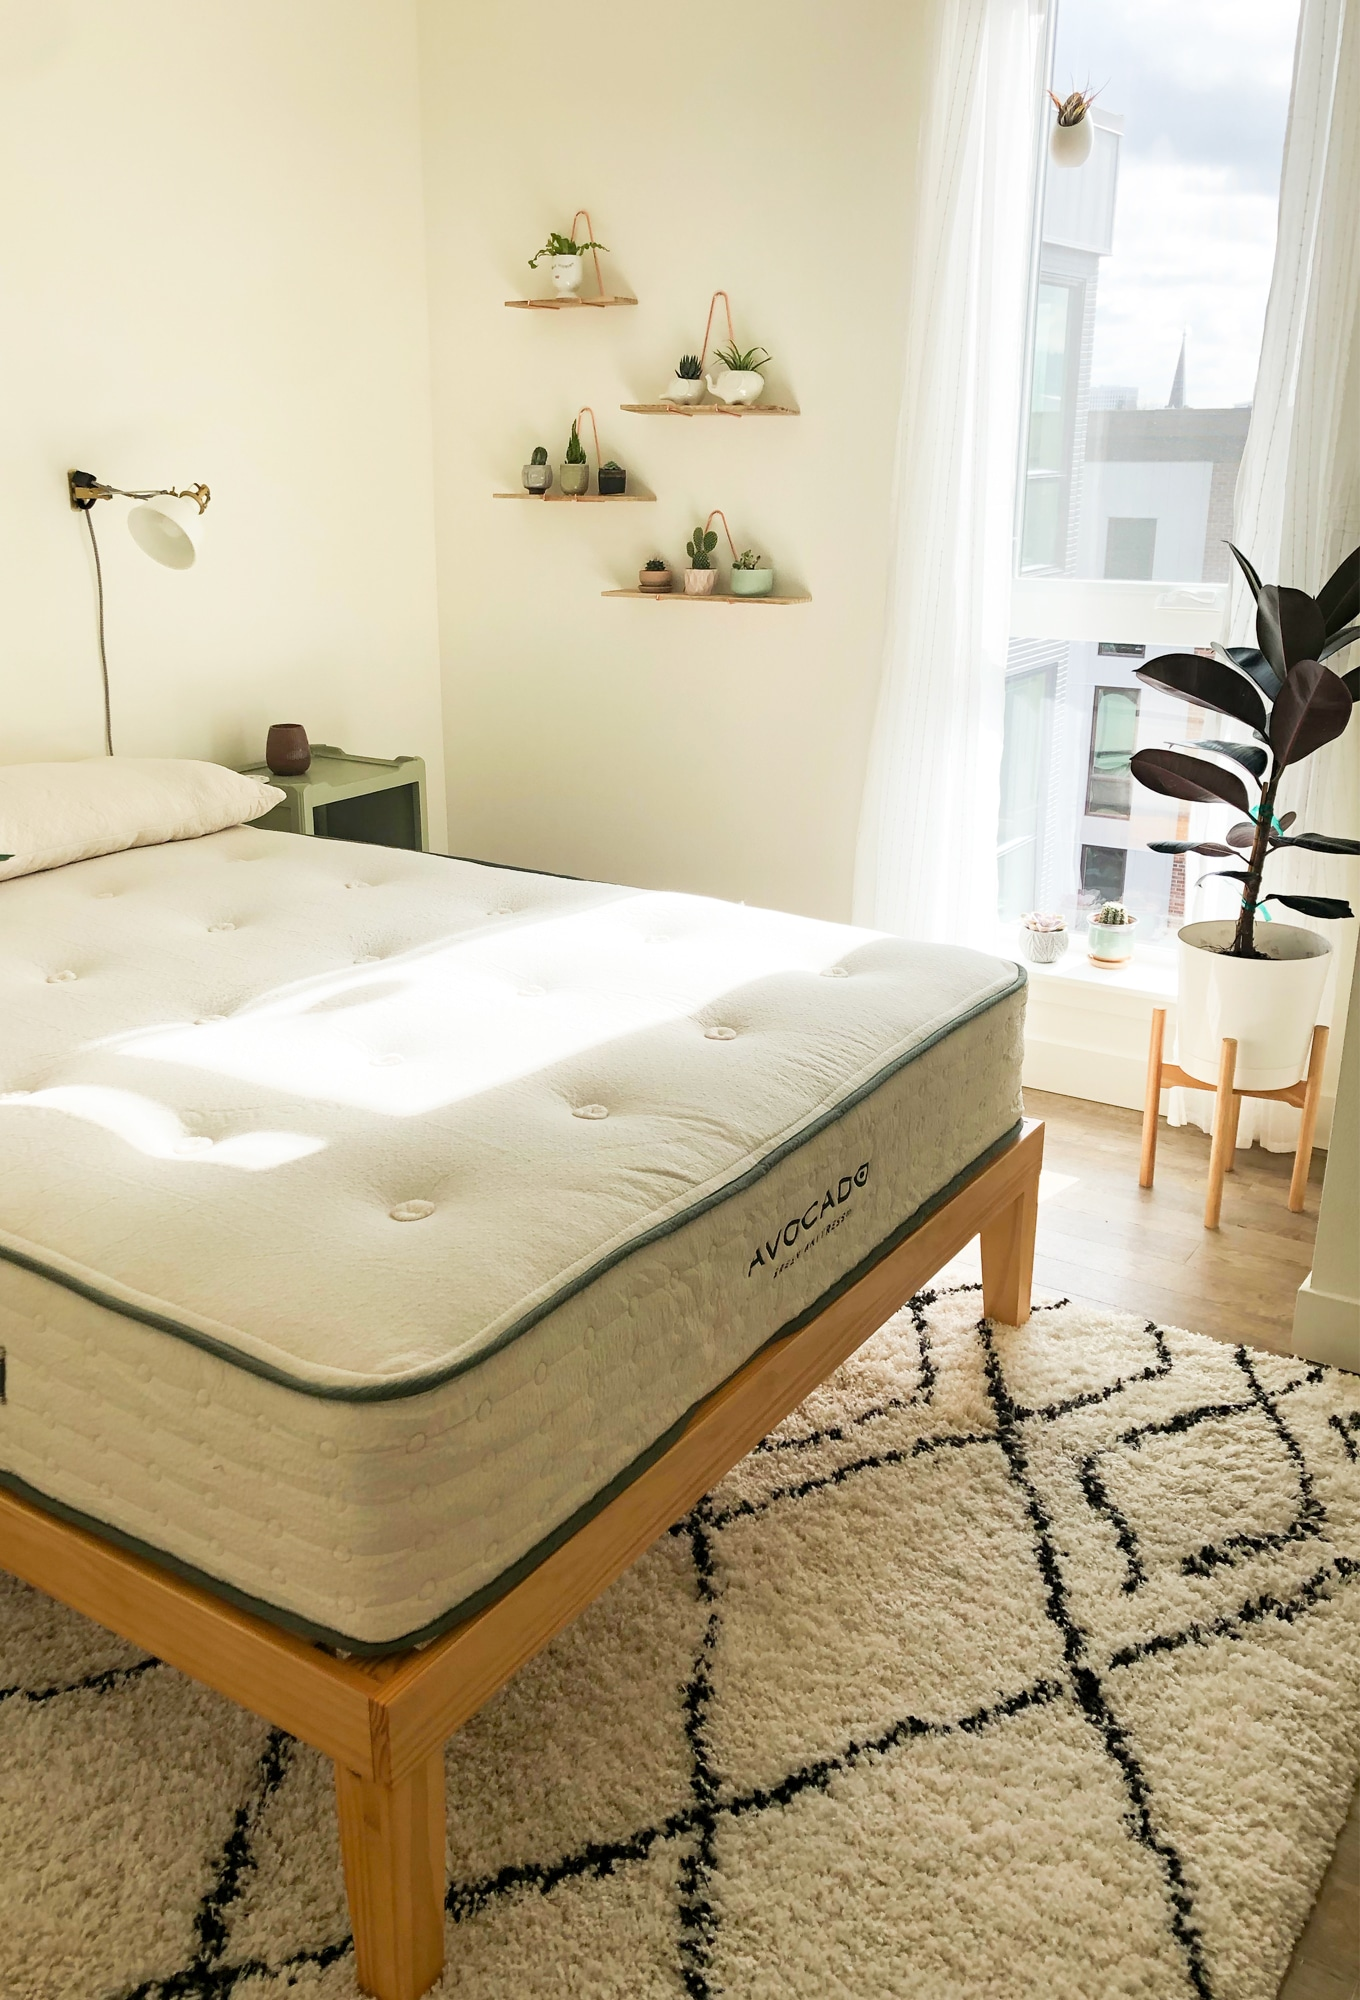 avocado brand mattress in modern bedroom